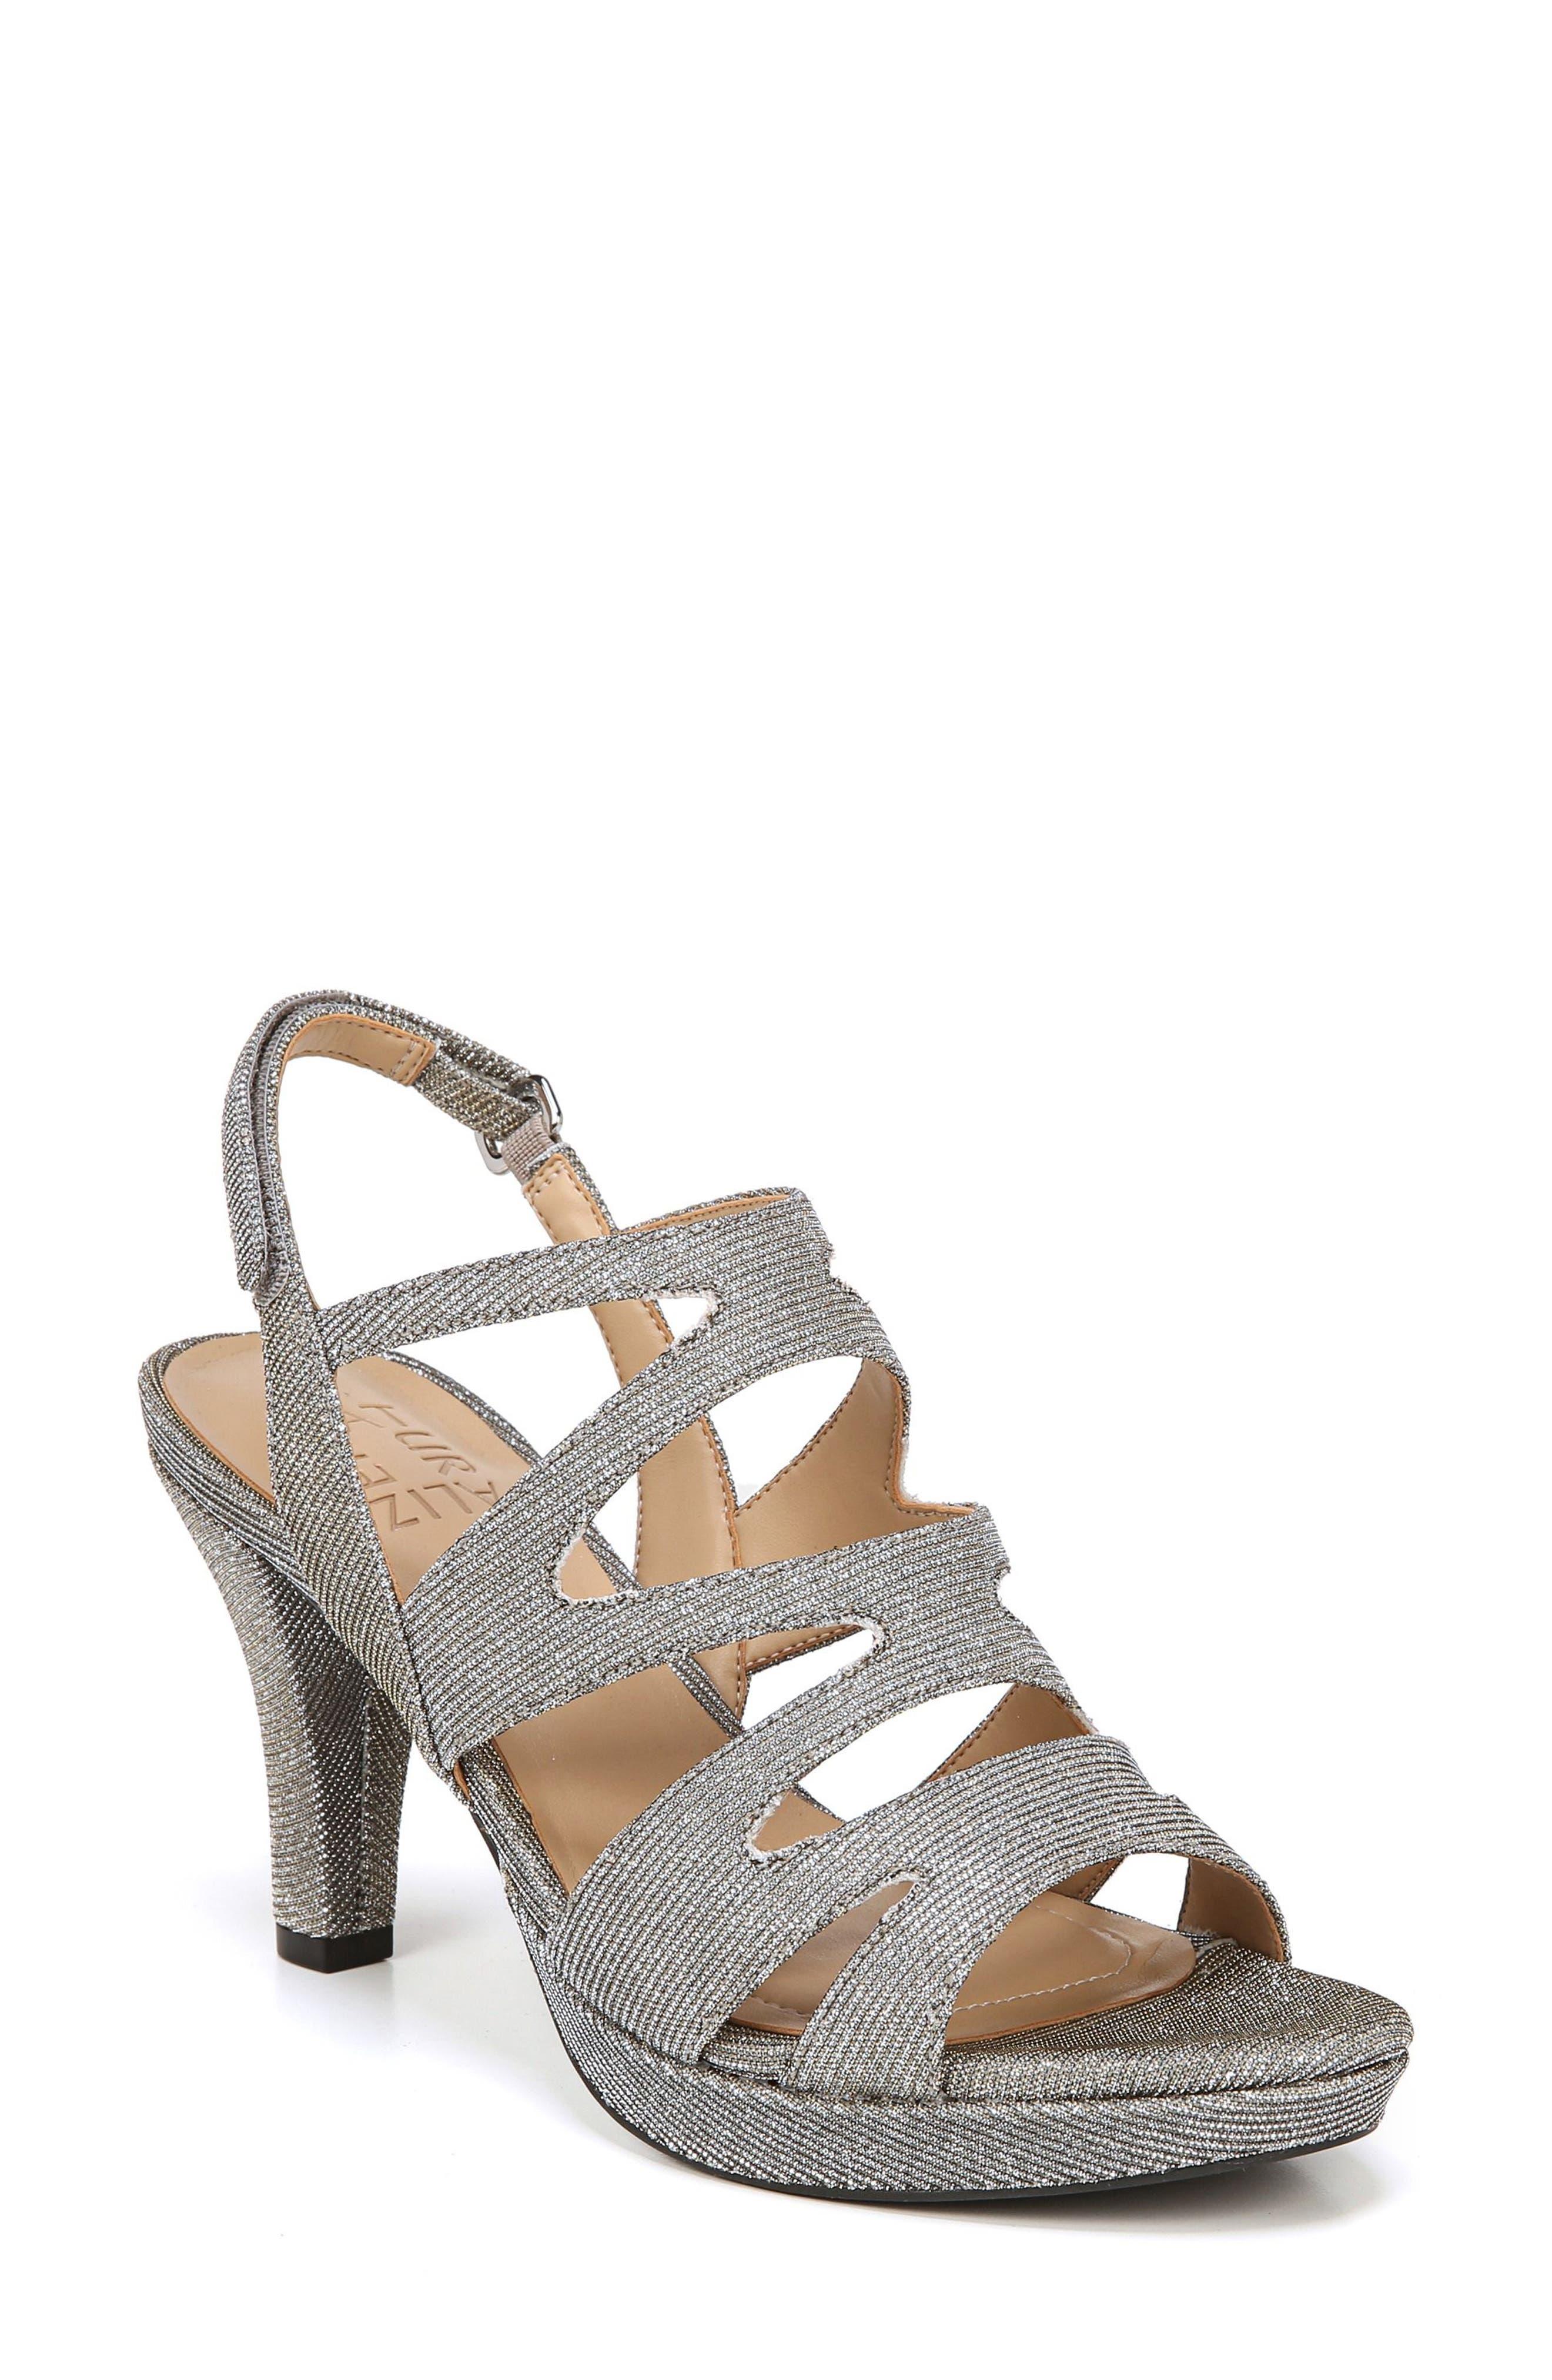 'Pressley' Slingback Platform Sandal,                             Main thumbnail 1, color,                             Alloy Sparkle Fabric